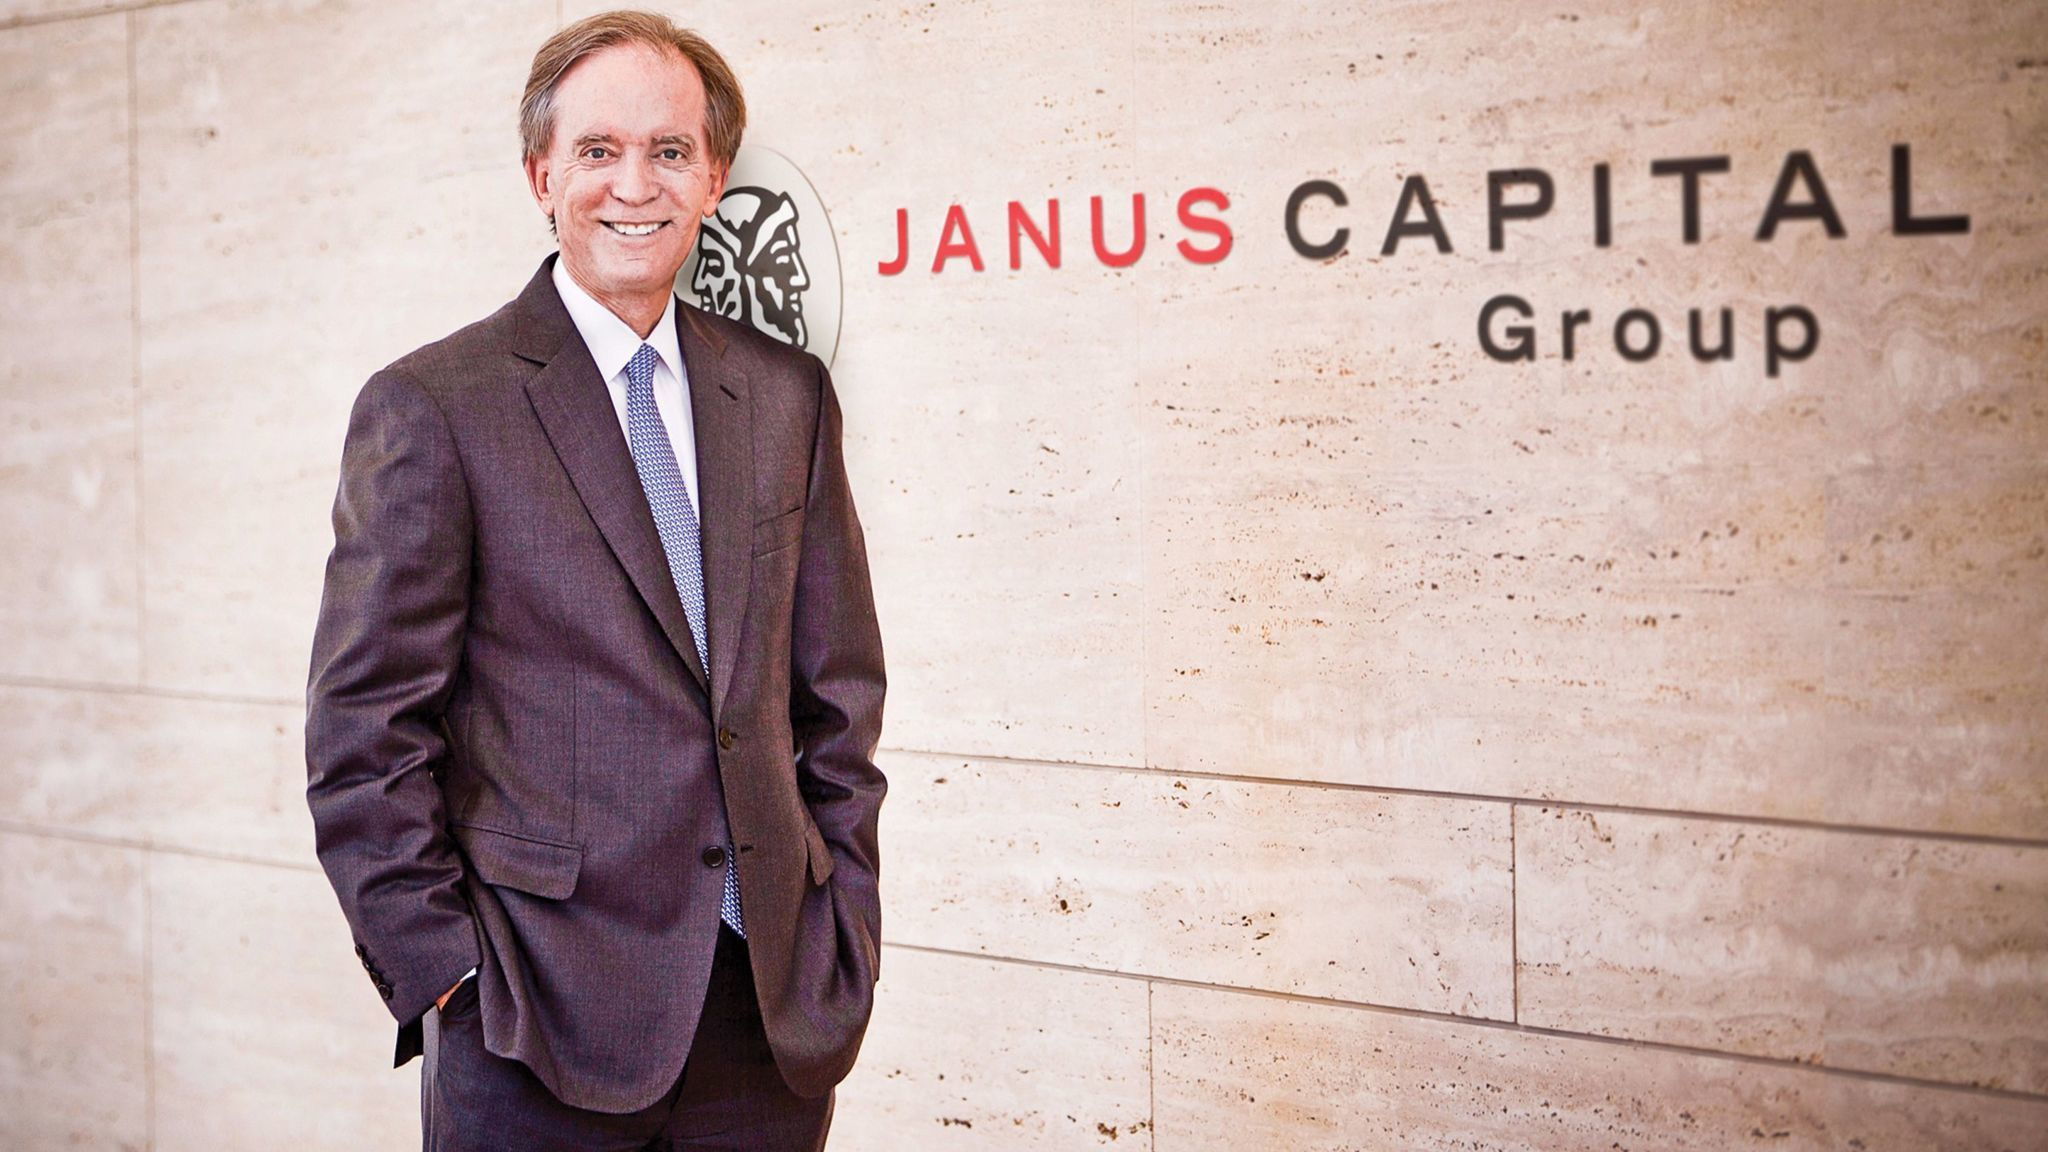 Bond king Bill Gross agrees to settlement in lawsuit against Pimco, ending nasty dispute